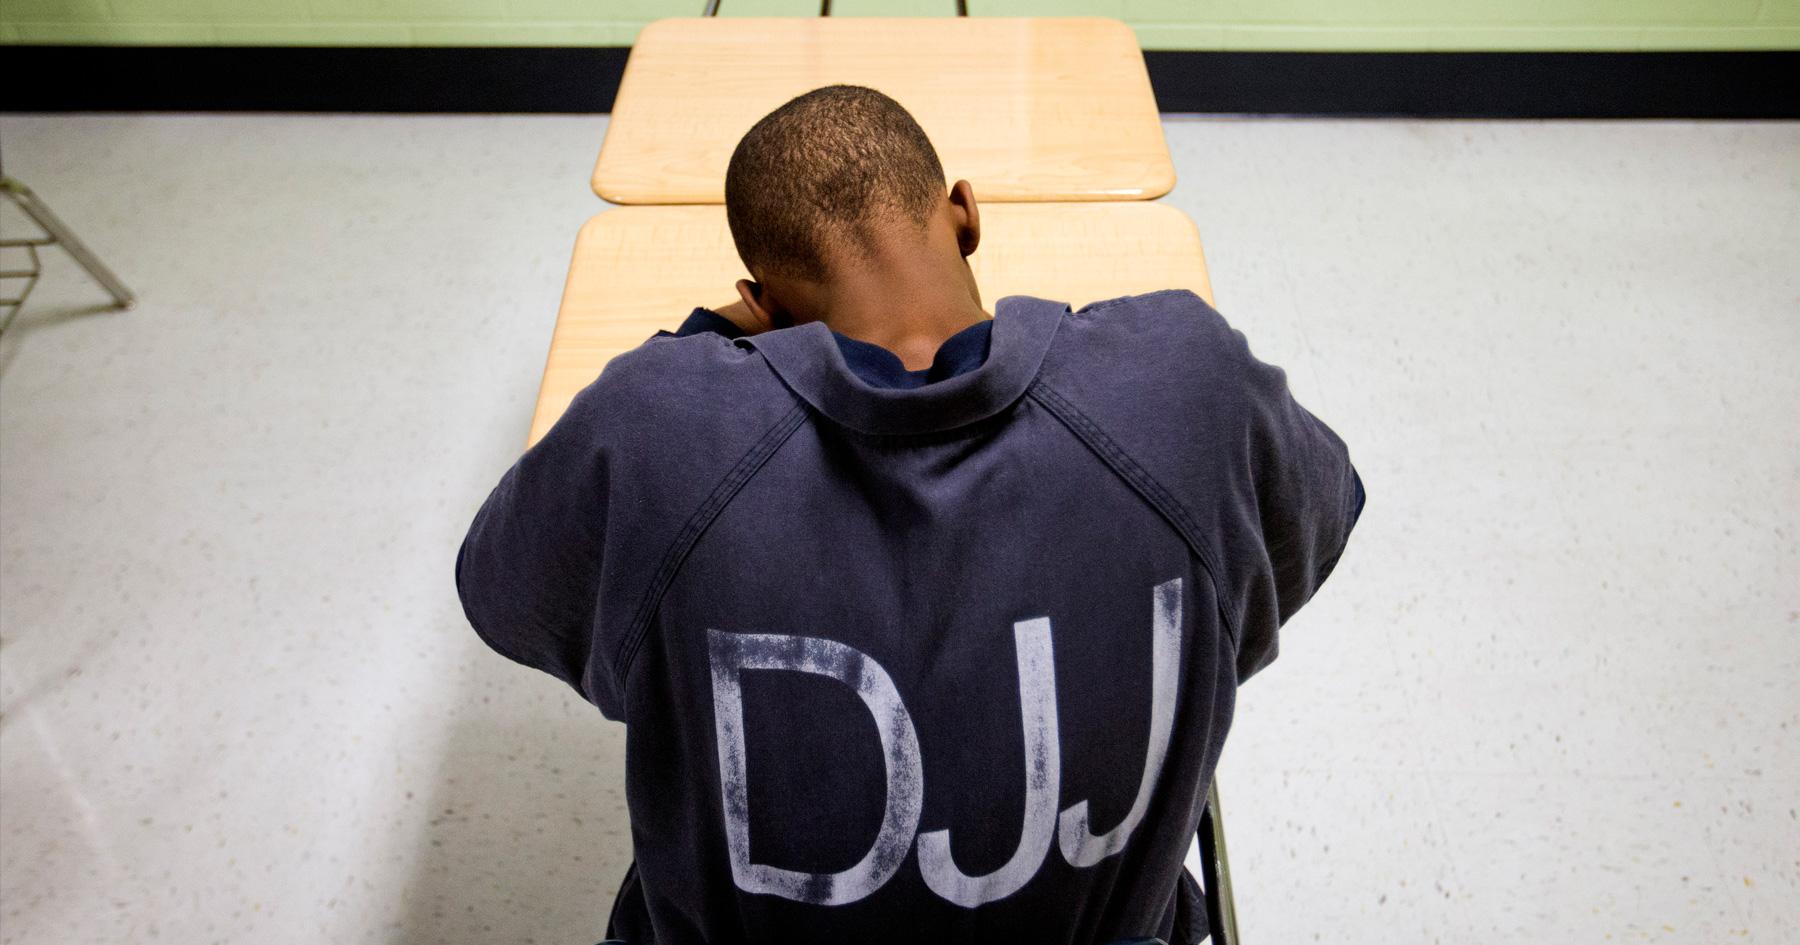 Juveniles in prison